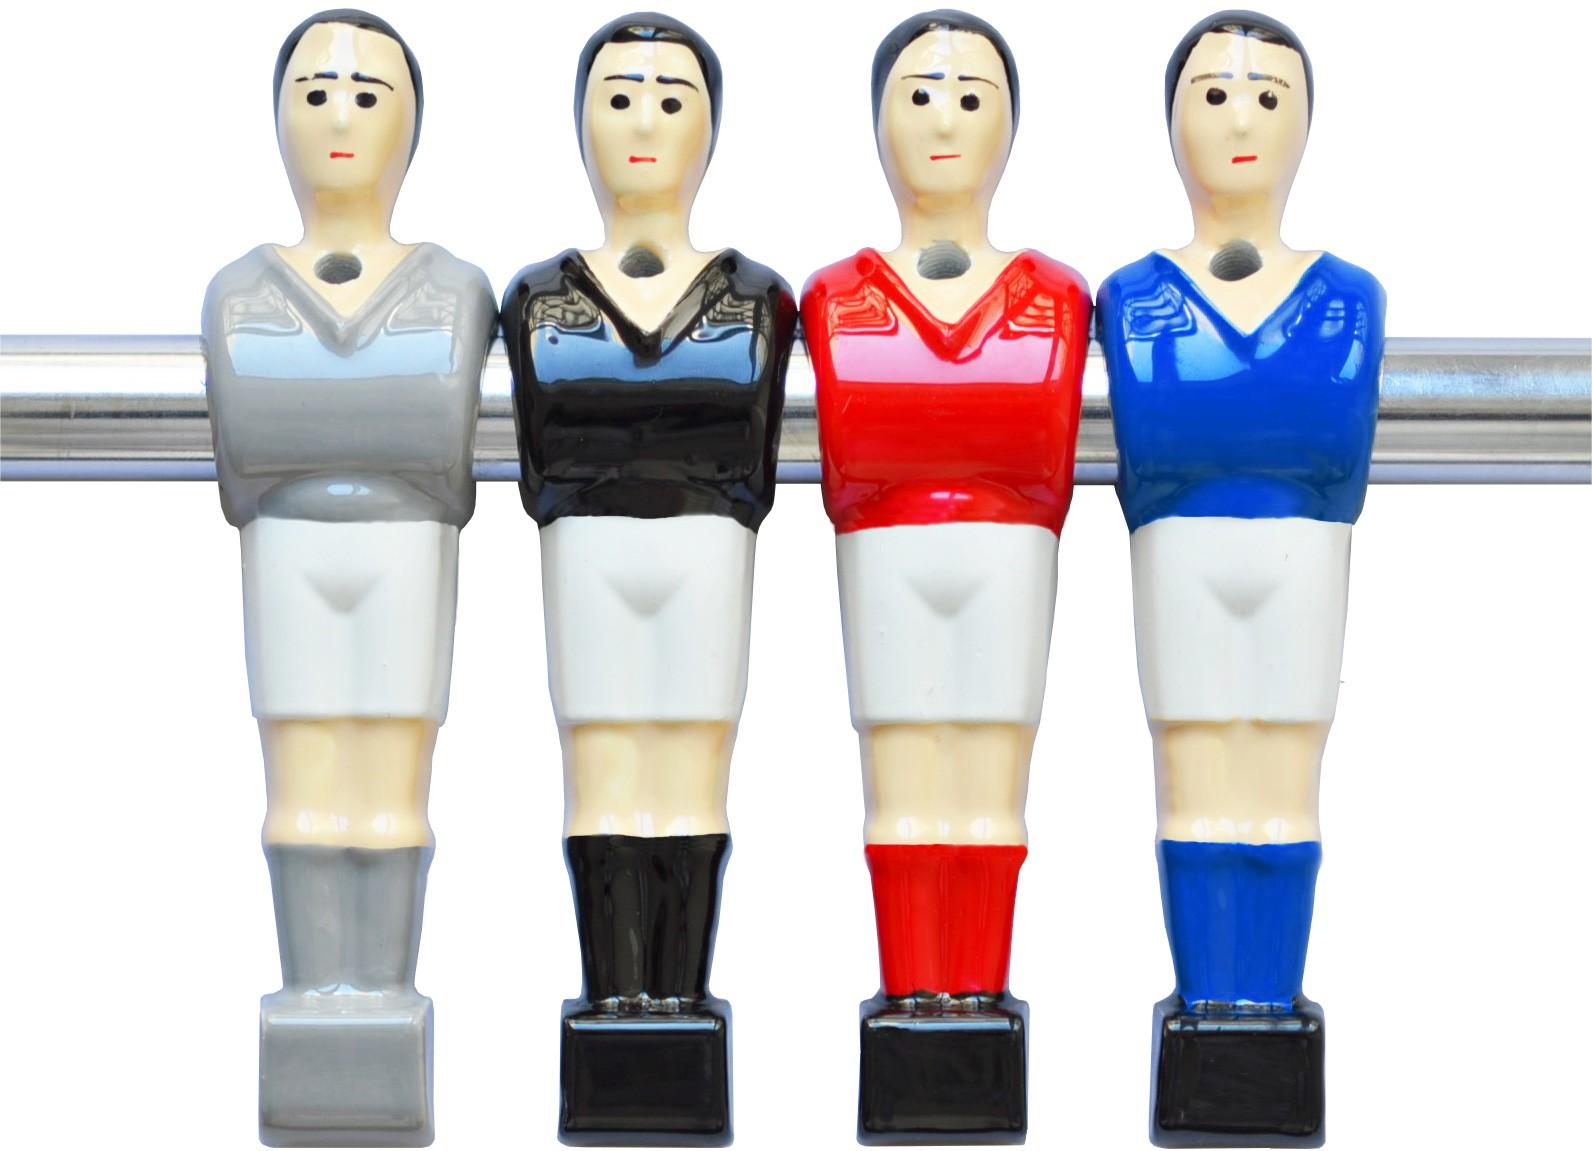 baby foot nombre de joueur